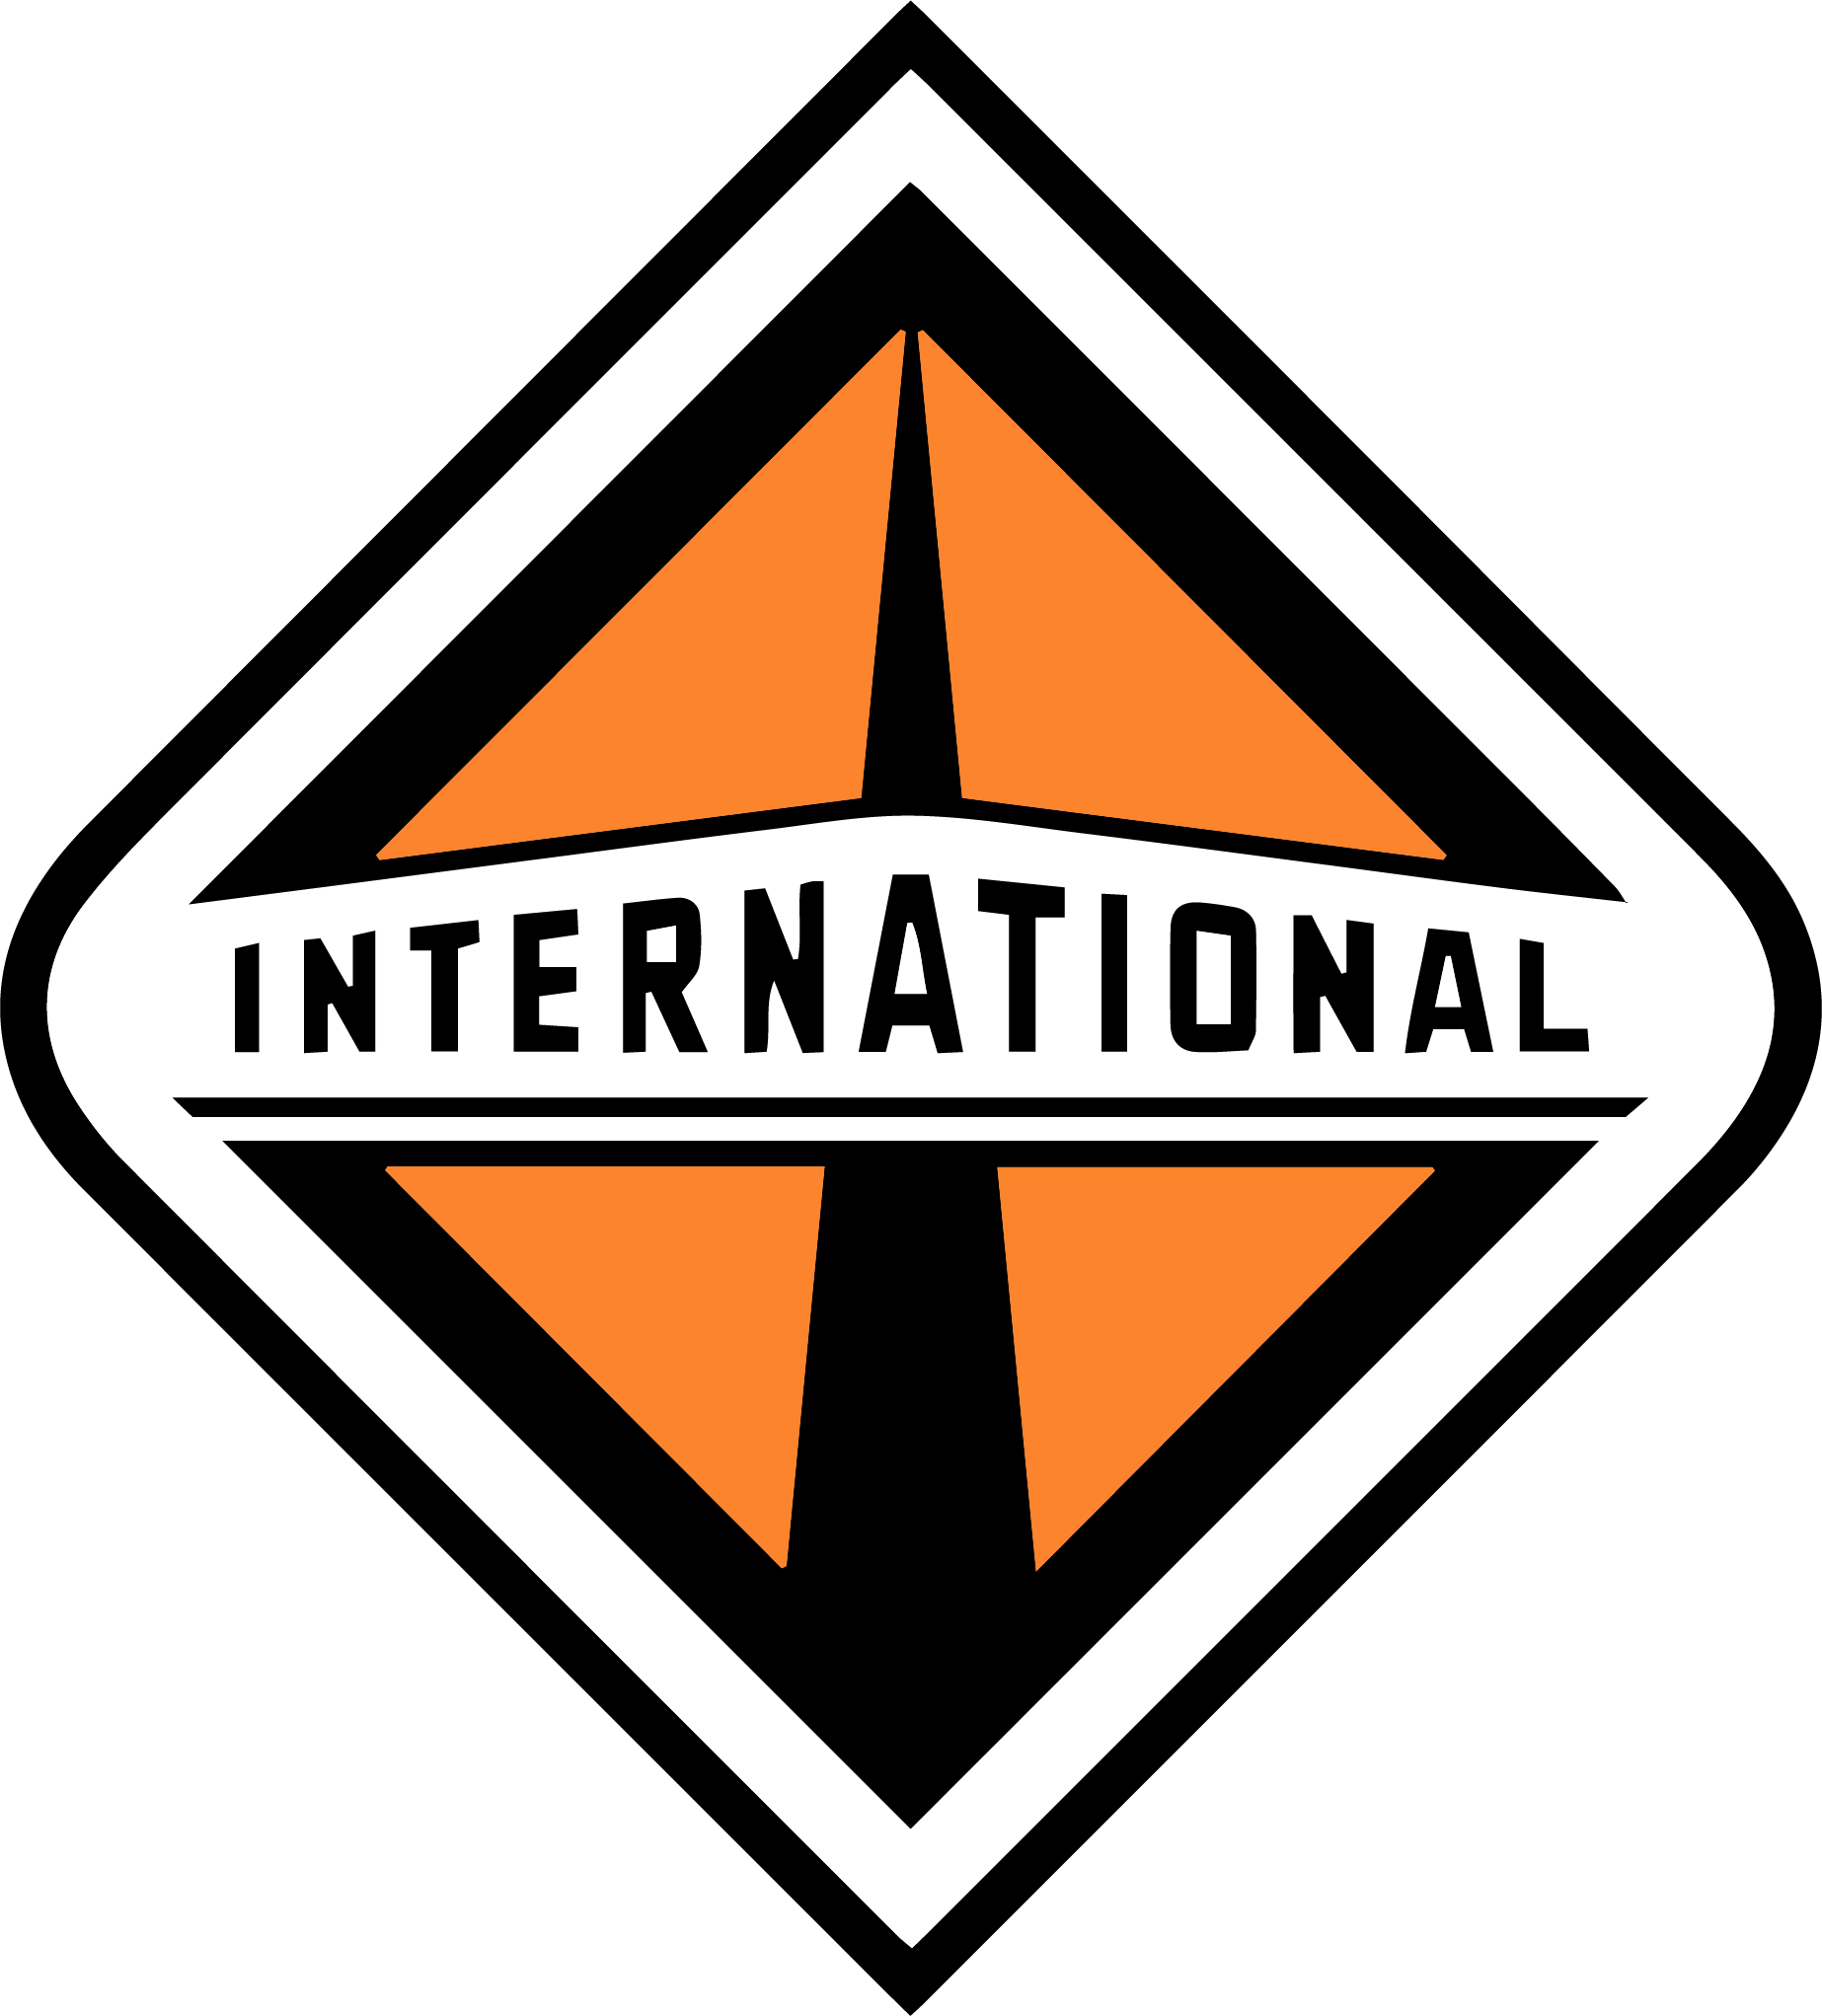 InternationalTruckslogo2002flat